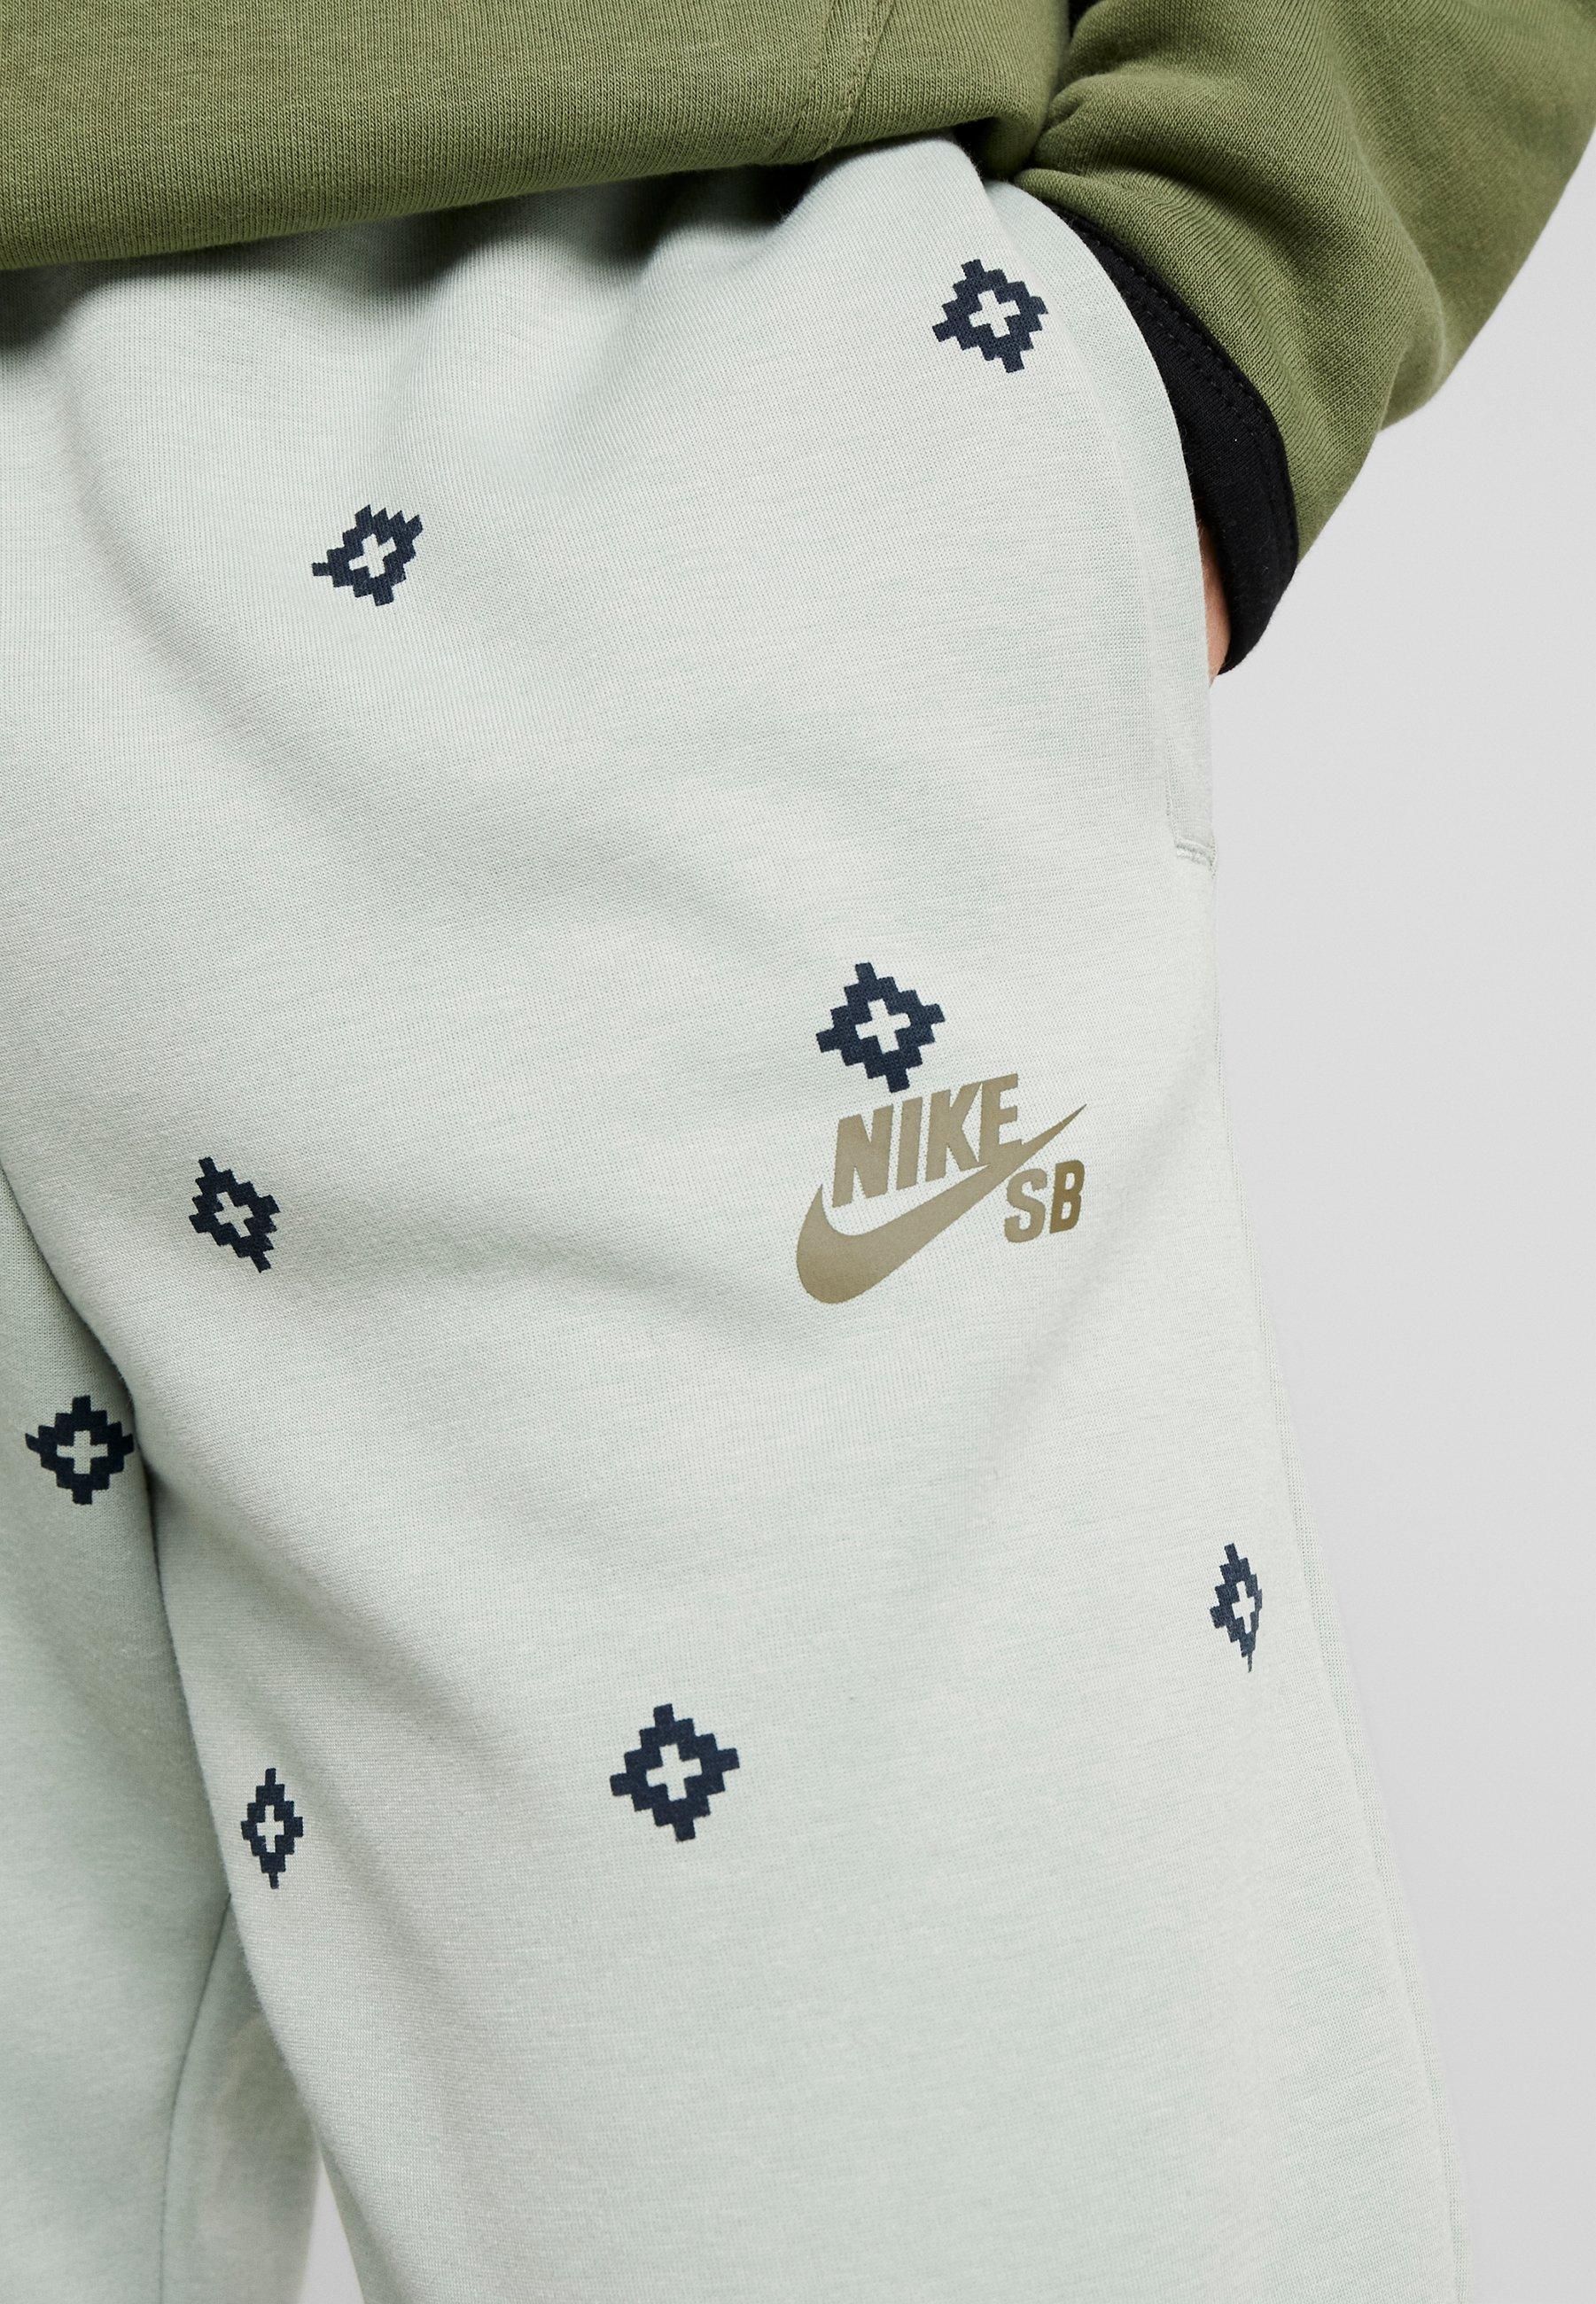 Nike Sb Dry Track Pant - Trainingsbroek Jade Horizon/medium Olive 9joeSRKS R5WjOaIw